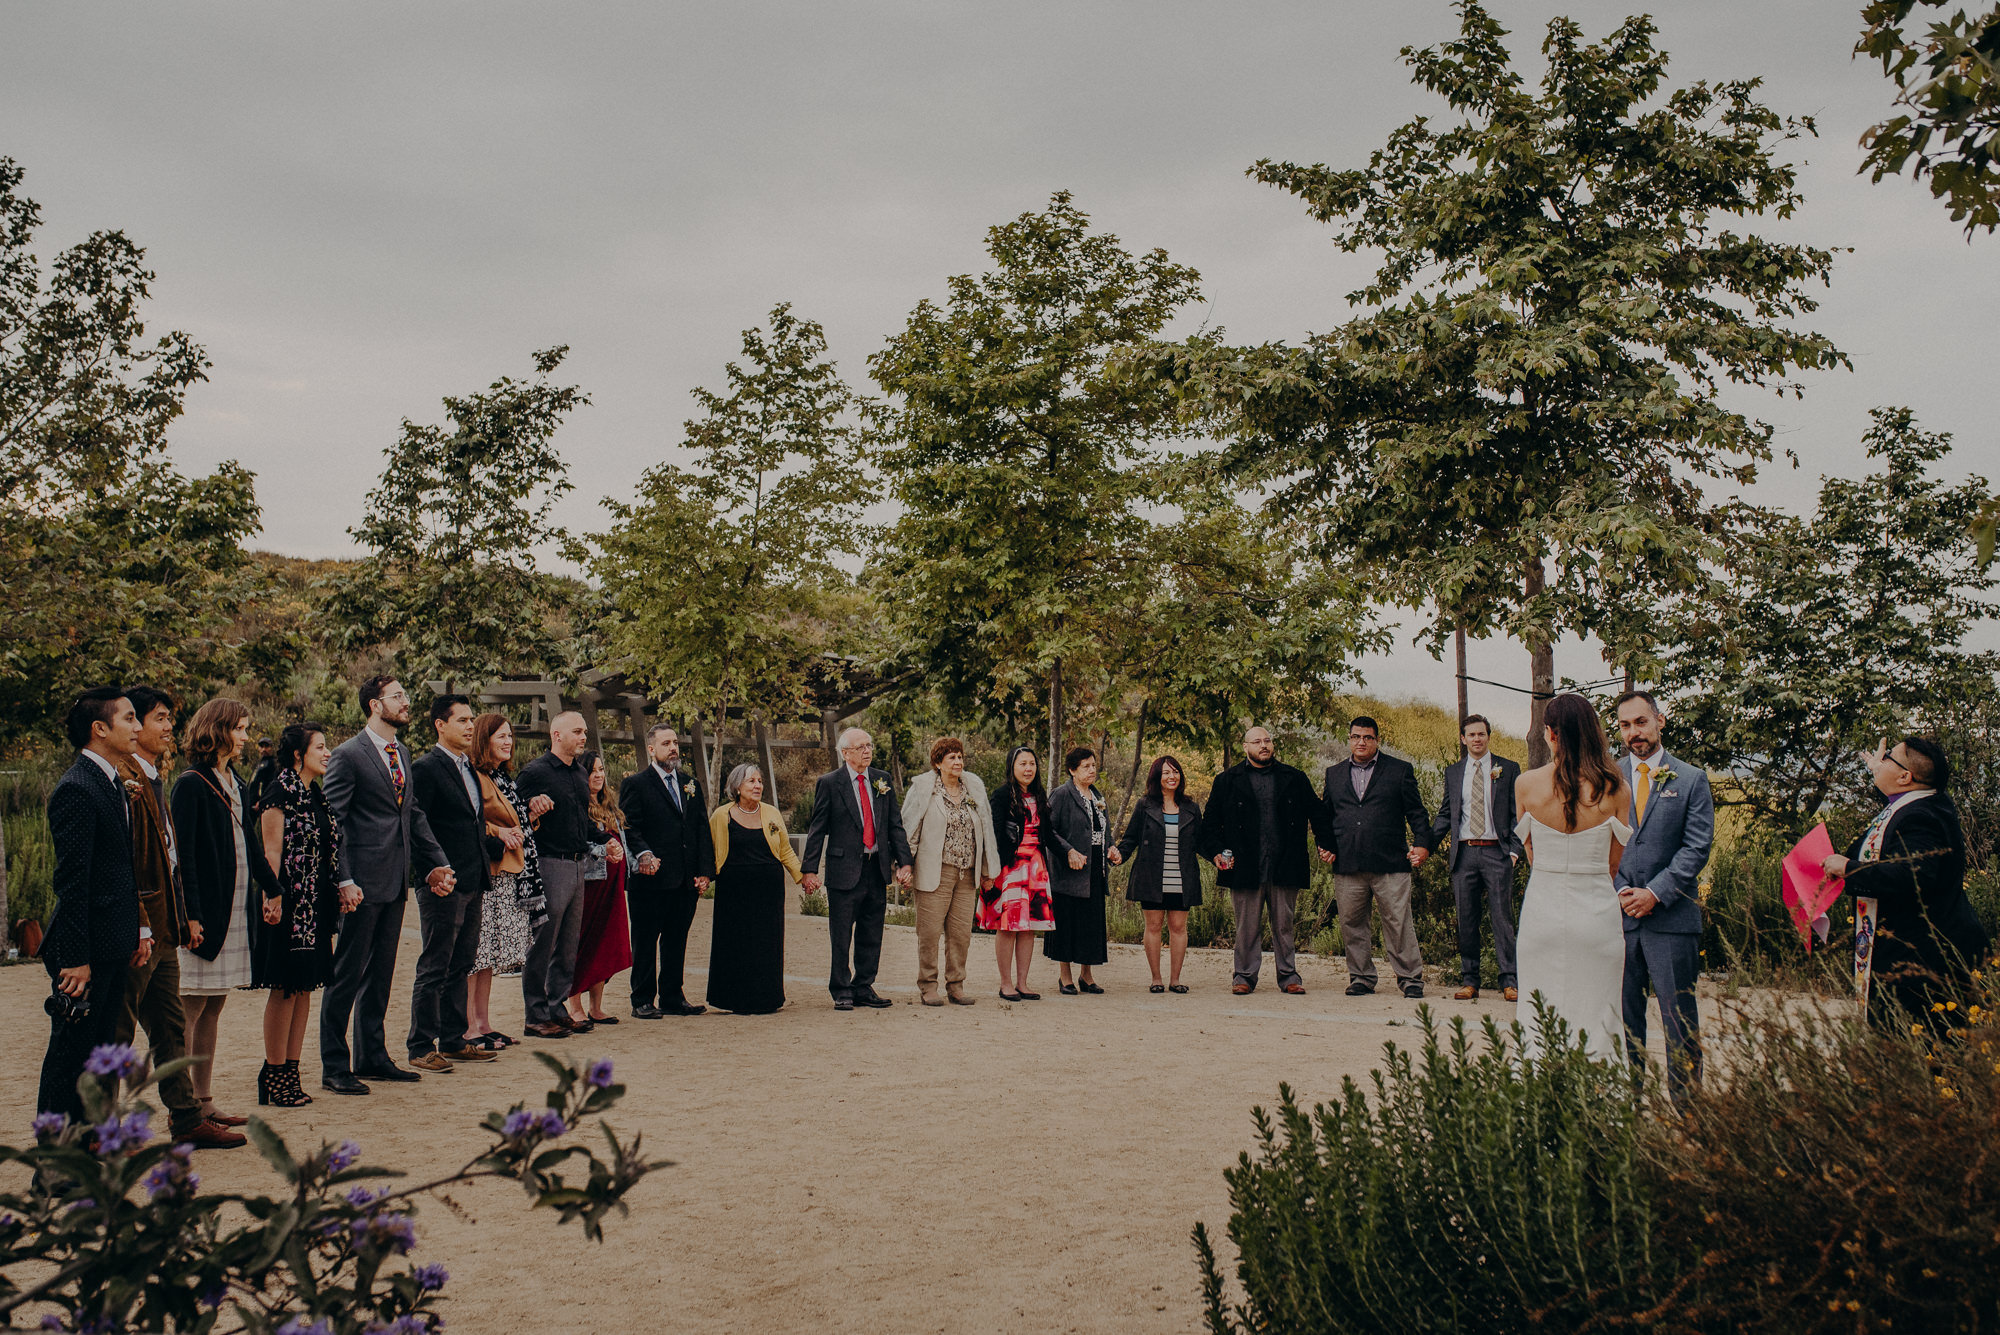 elopement photographer in los angeles - la wedding photographer - isaiahandtaylor.com-066.jpg